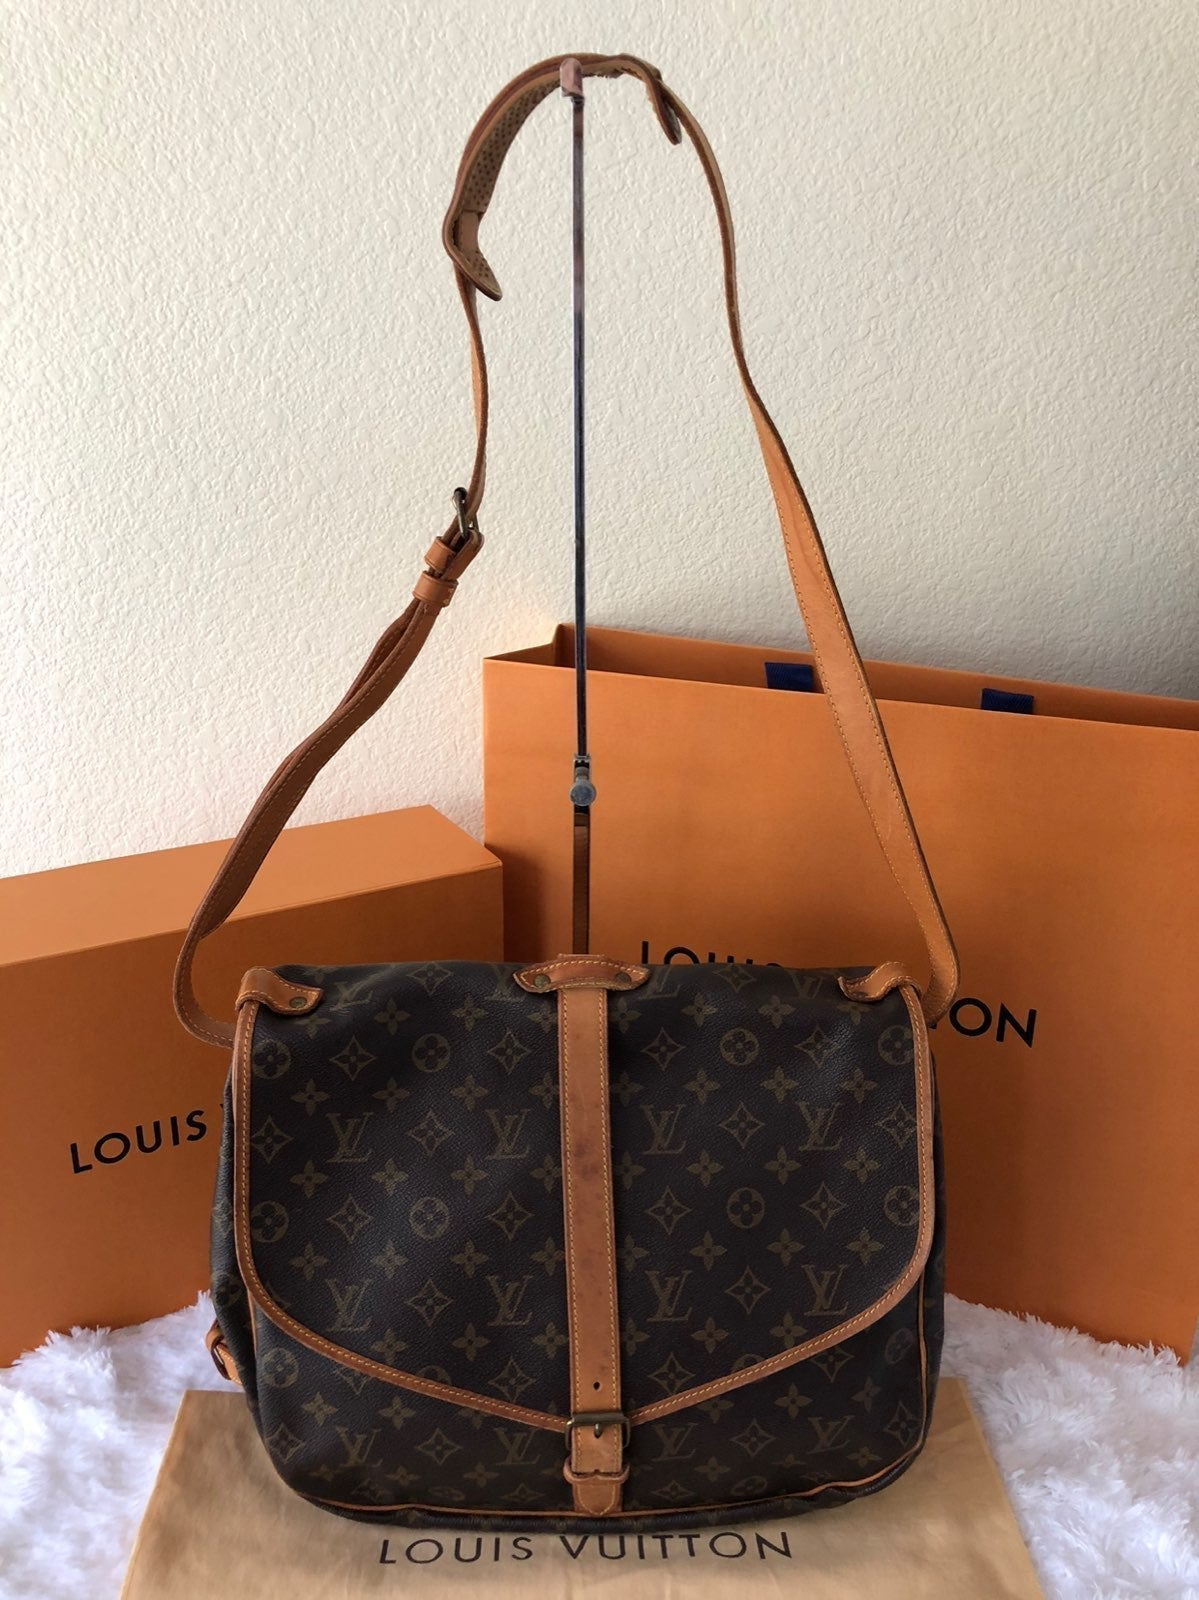 Louis Vuitton Saumur 35 Mono Sling Bag